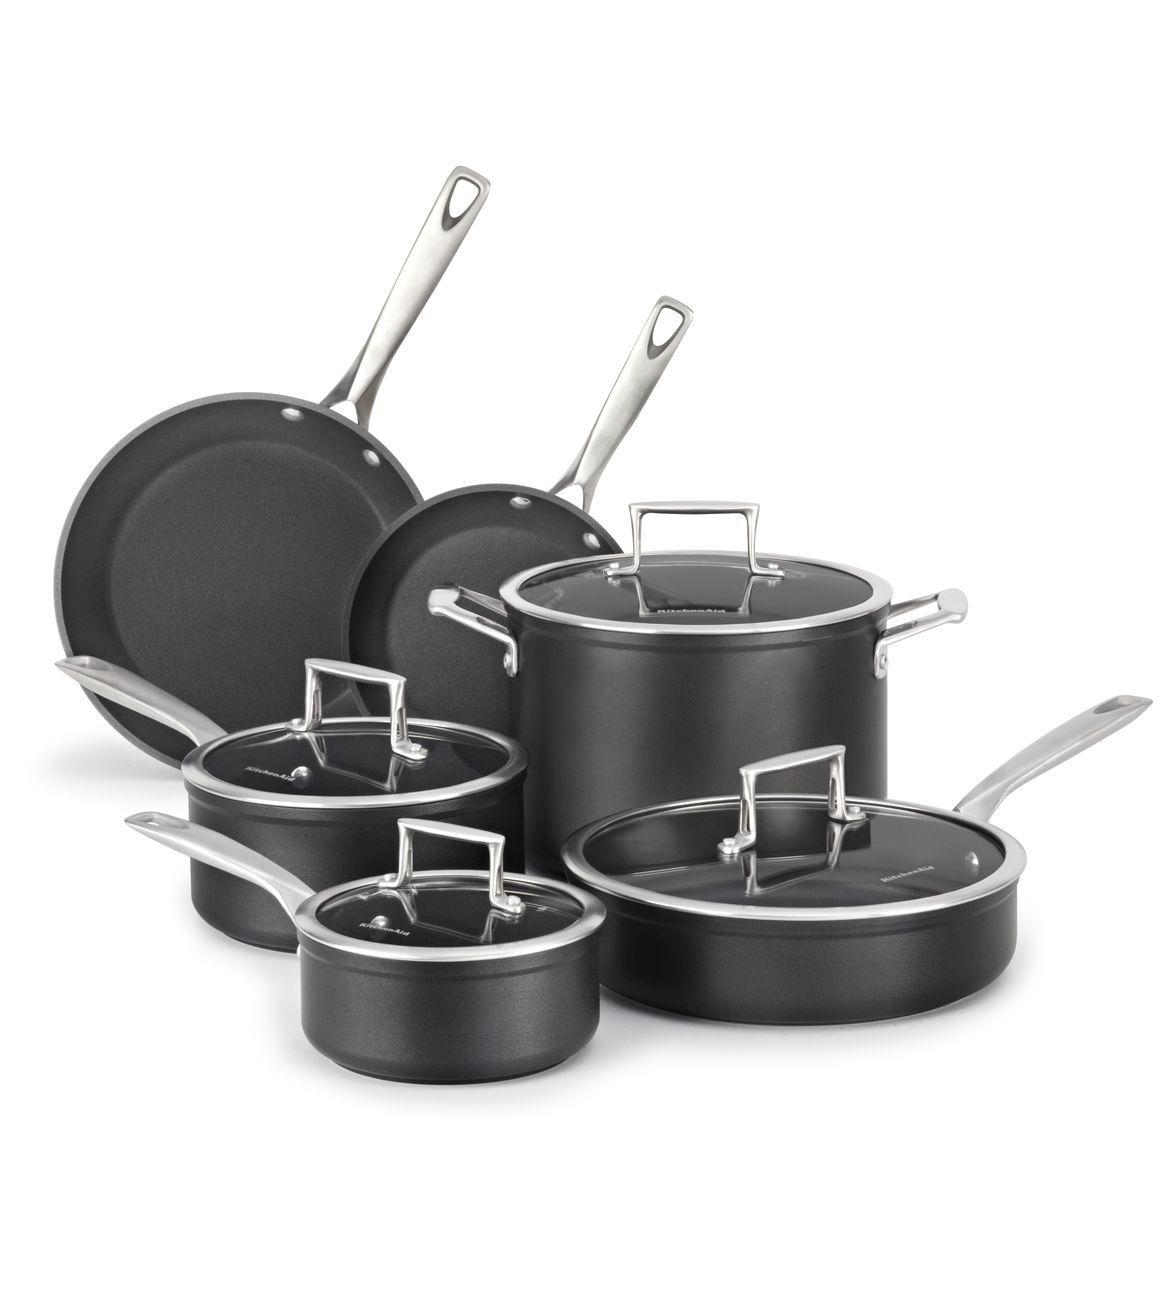 KitchenAid 10-Piece Professional Hard Anodized Pot Set - Master ...